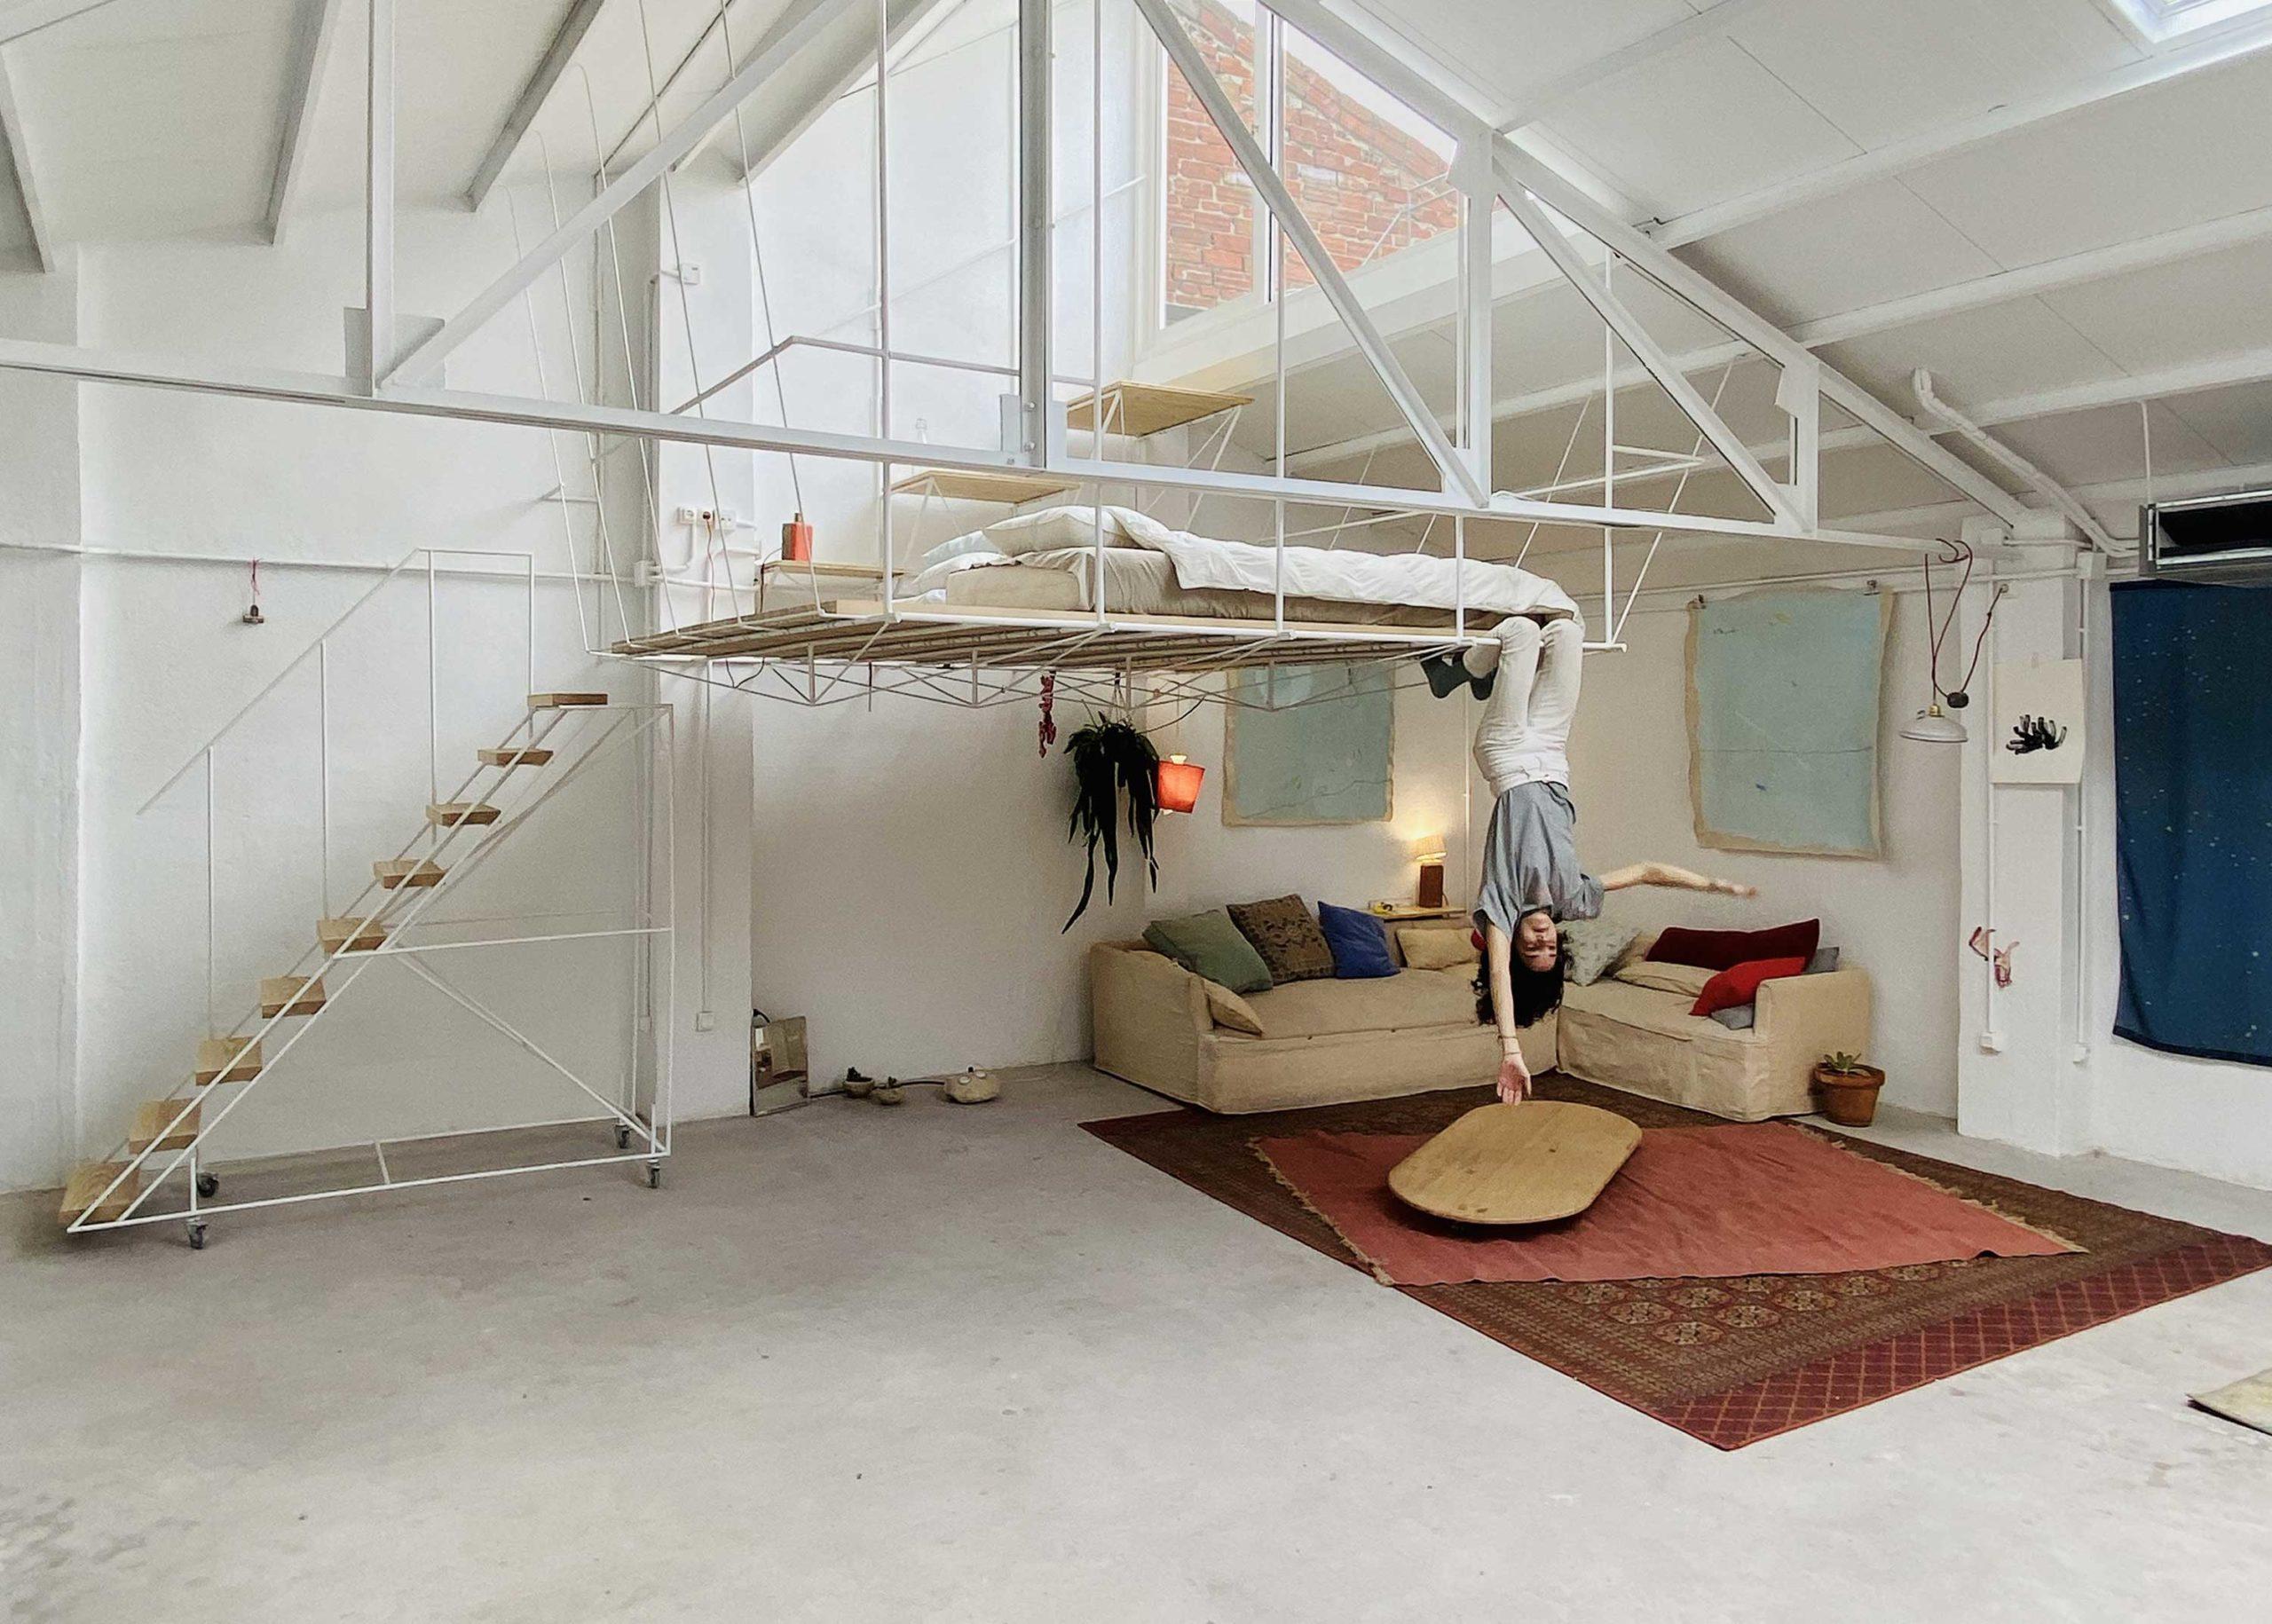 L'étonnant loft de Clara Cebrian à Madrid